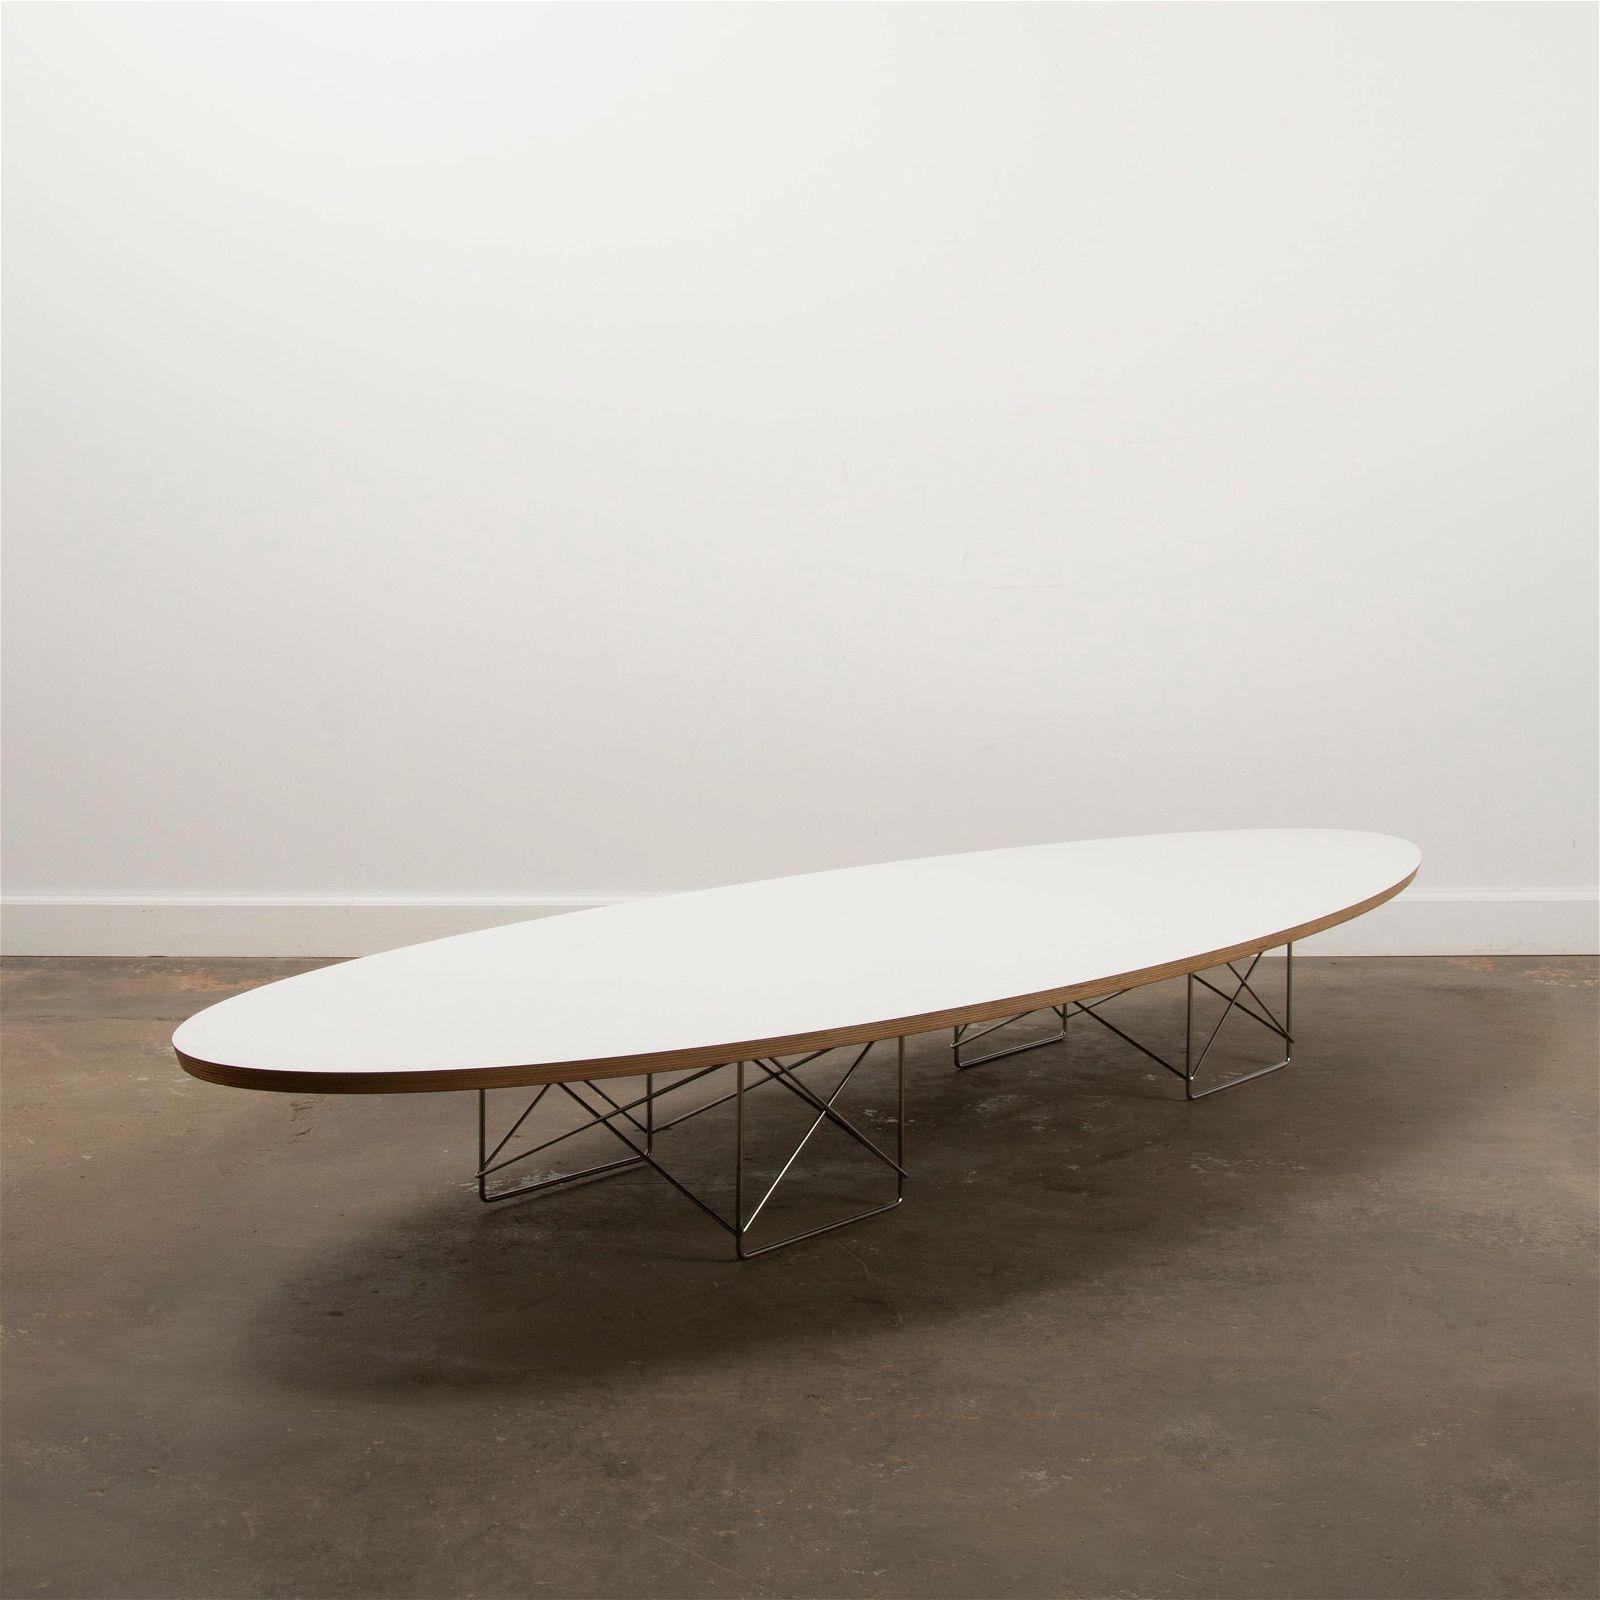 CHARLES & RAY EAMES / Herman Miller ETR Surfboard Table